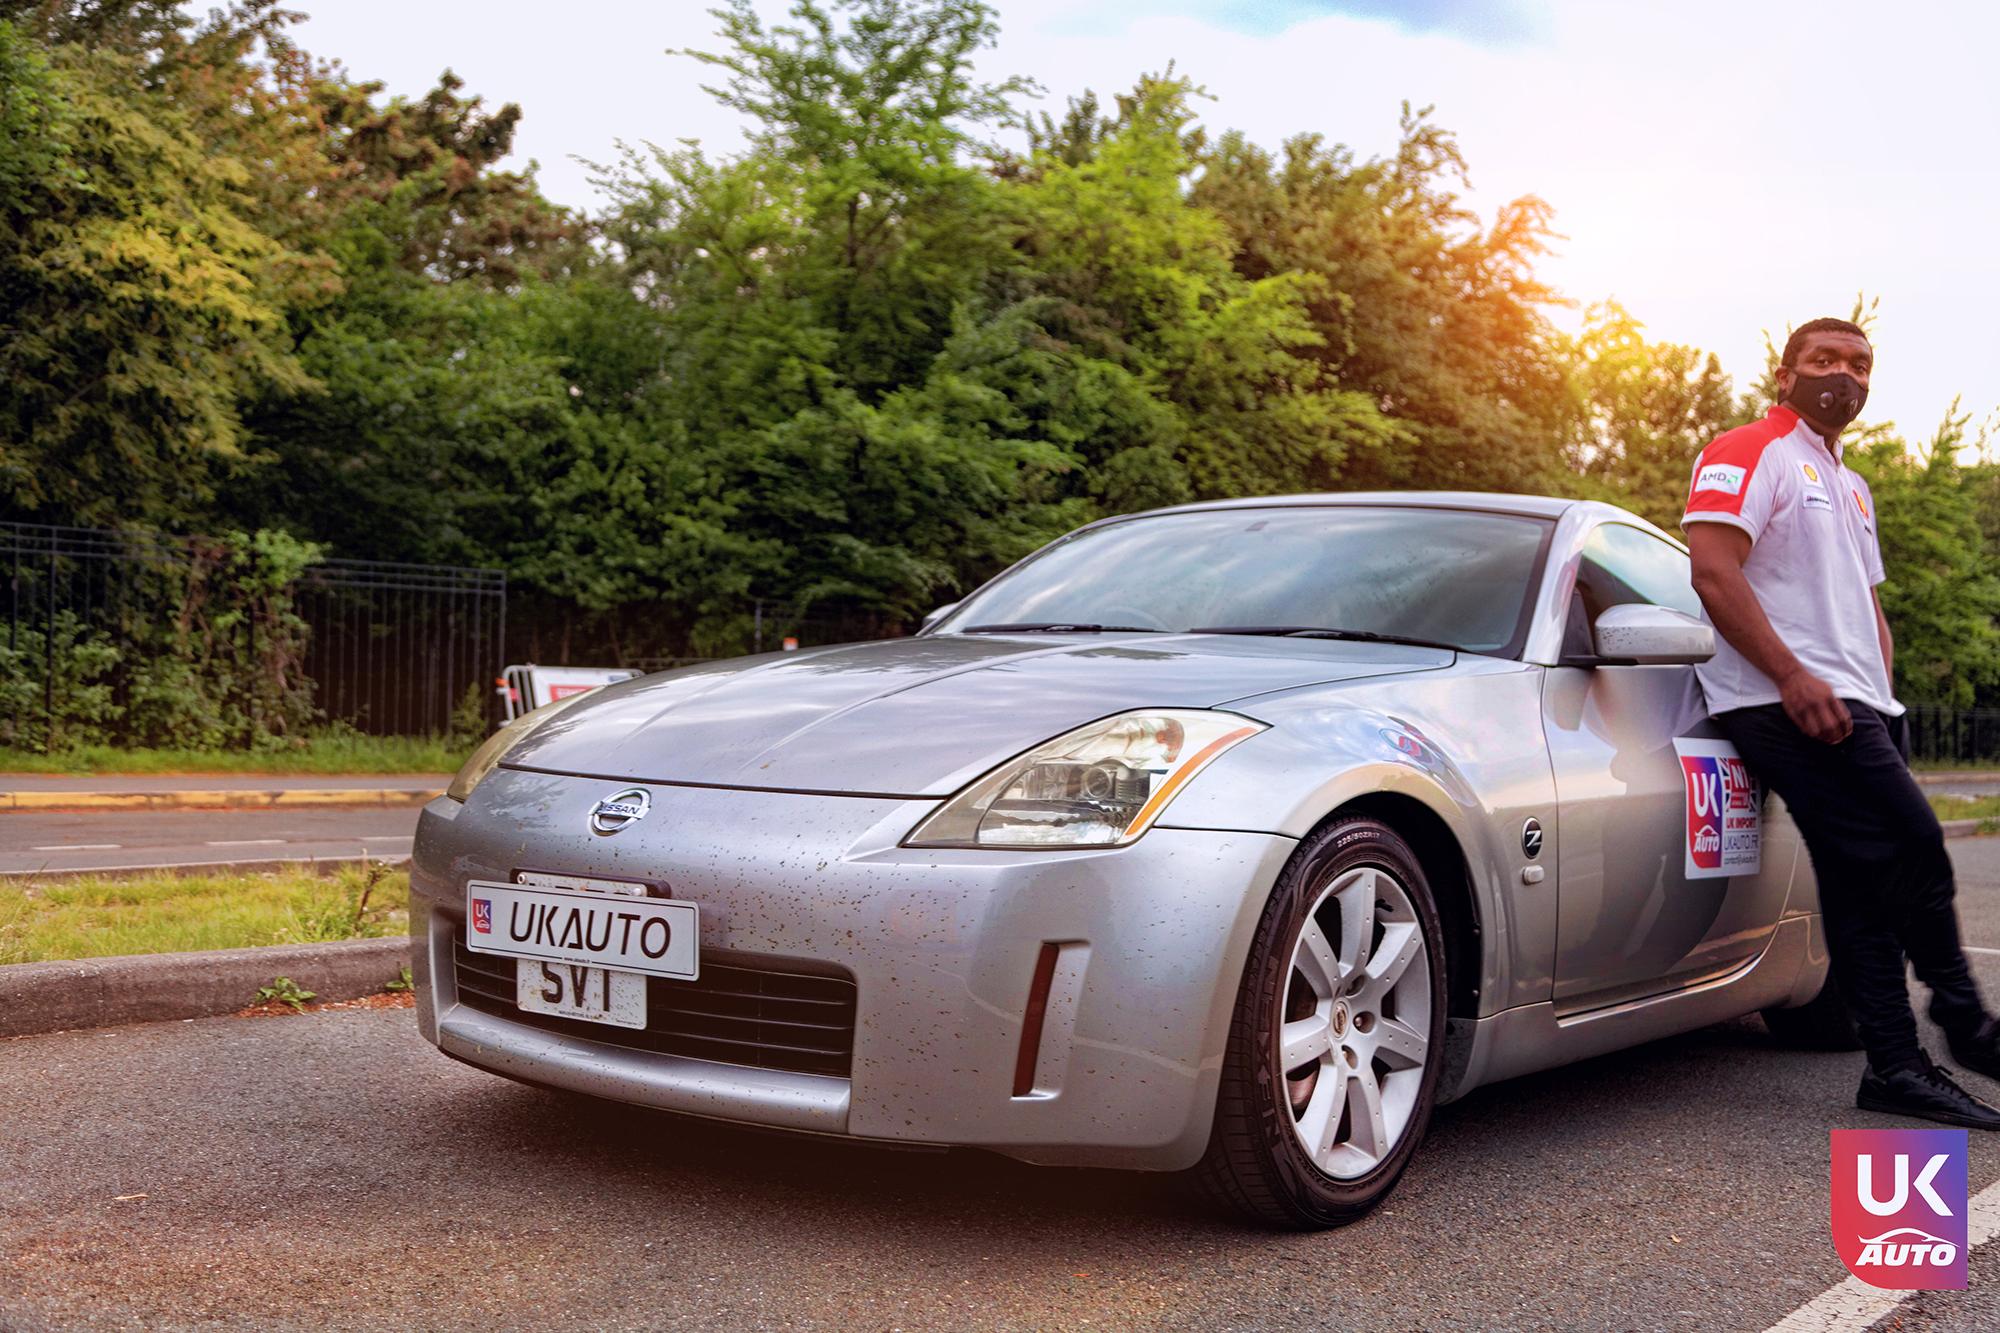 Ukauto import nissan 350z jdm import fairlady v6 import uk ukauto rhd nissan import uk15 - Import Nissan 350Z JDM IMPORT 3.5 V6 TIPTRONIC IMPORT AUTO par UKAUTO